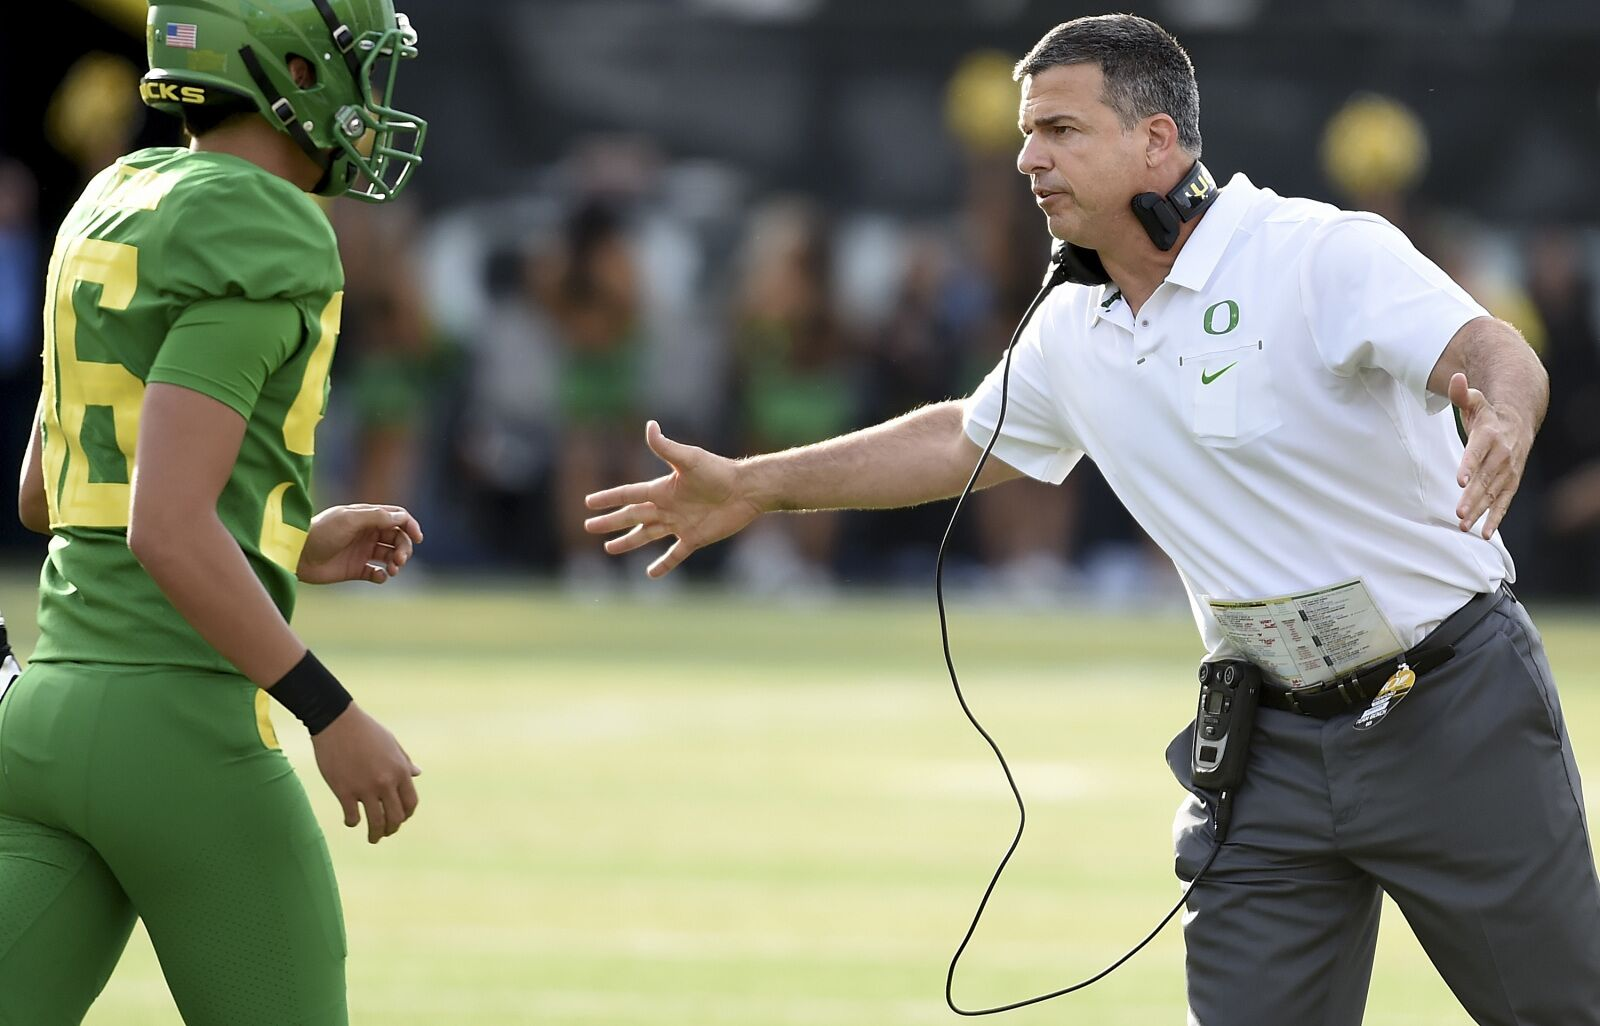 Oregon Football: Mario Cristobal Focused On Longer Term Success